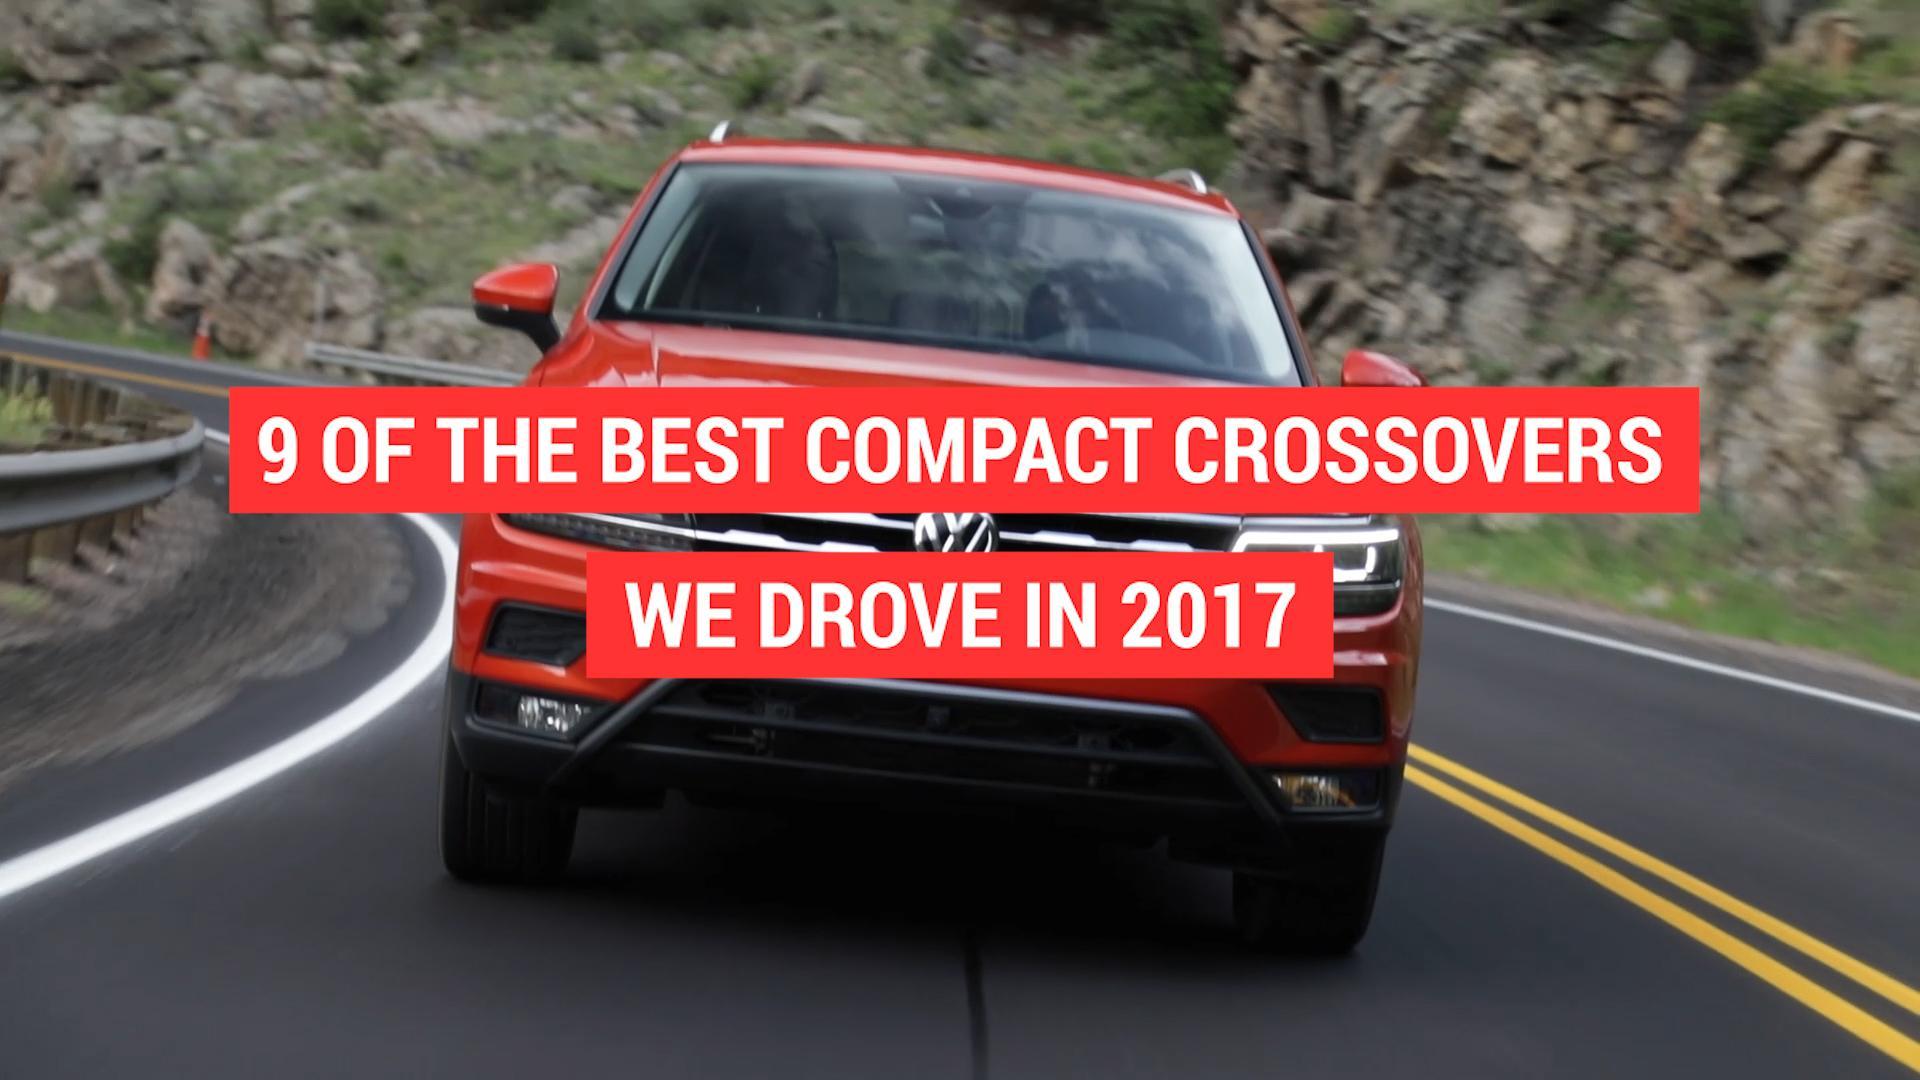 2020 Chevy Suburban independent rear suspension spied - Autoblog